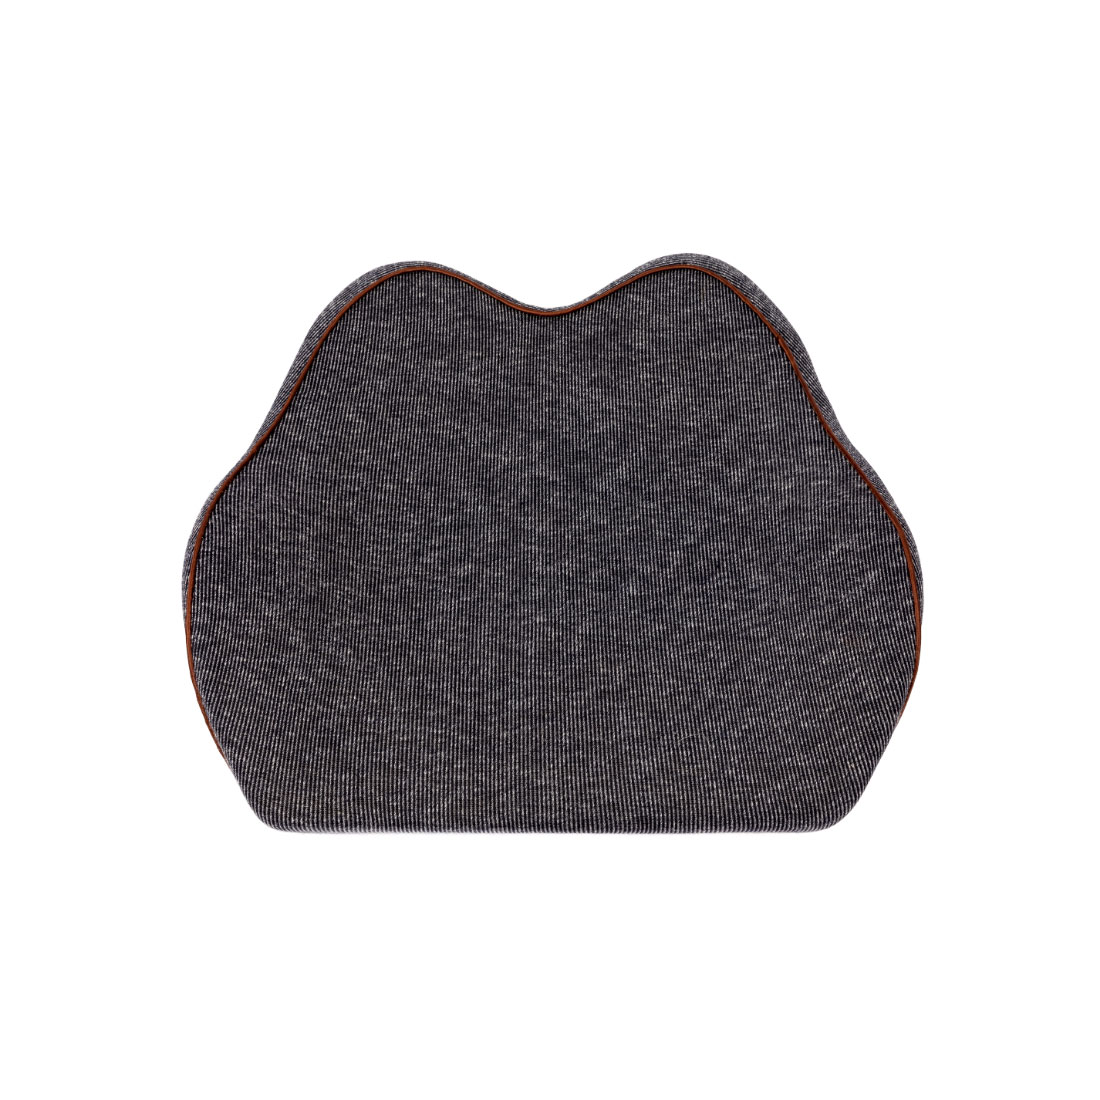 An image of Cubii Lumbar Support Cushion